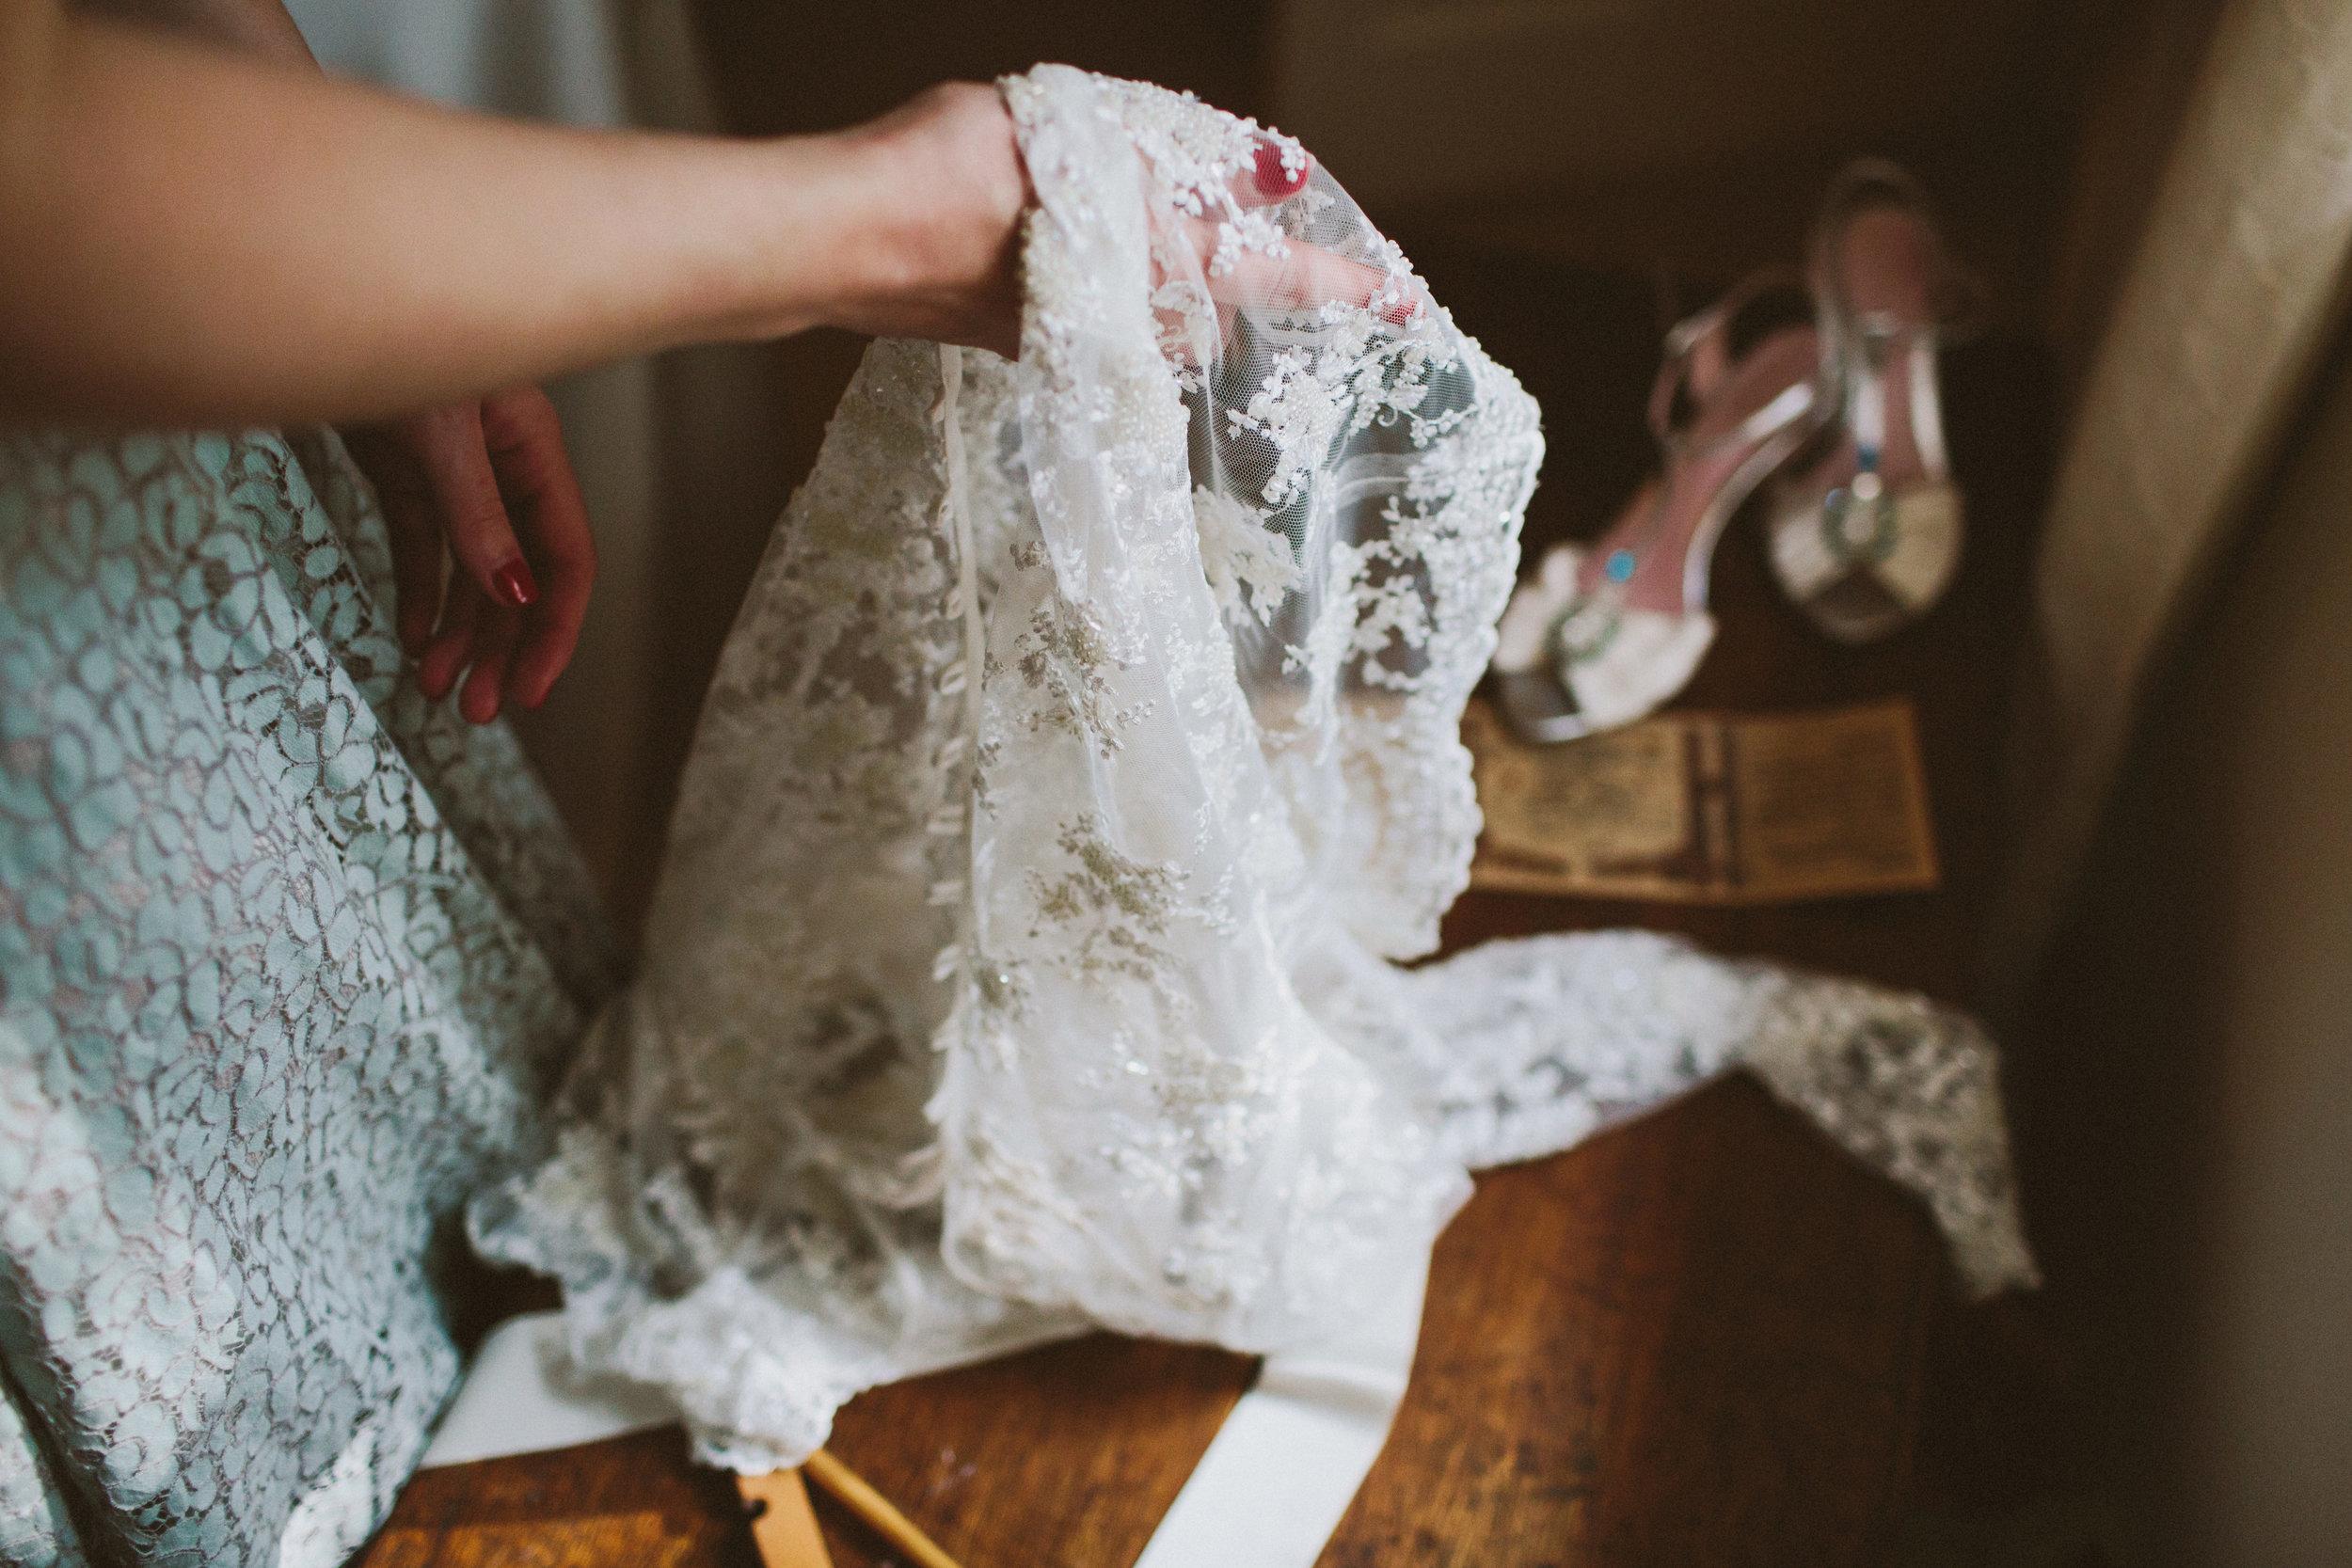 Jo-Peak-District-Autumn-Wedding-Bespoke-Vintage-Bias-Wedding-Gown-Lace-Jacket-Susanna-Greening-Matlock-6